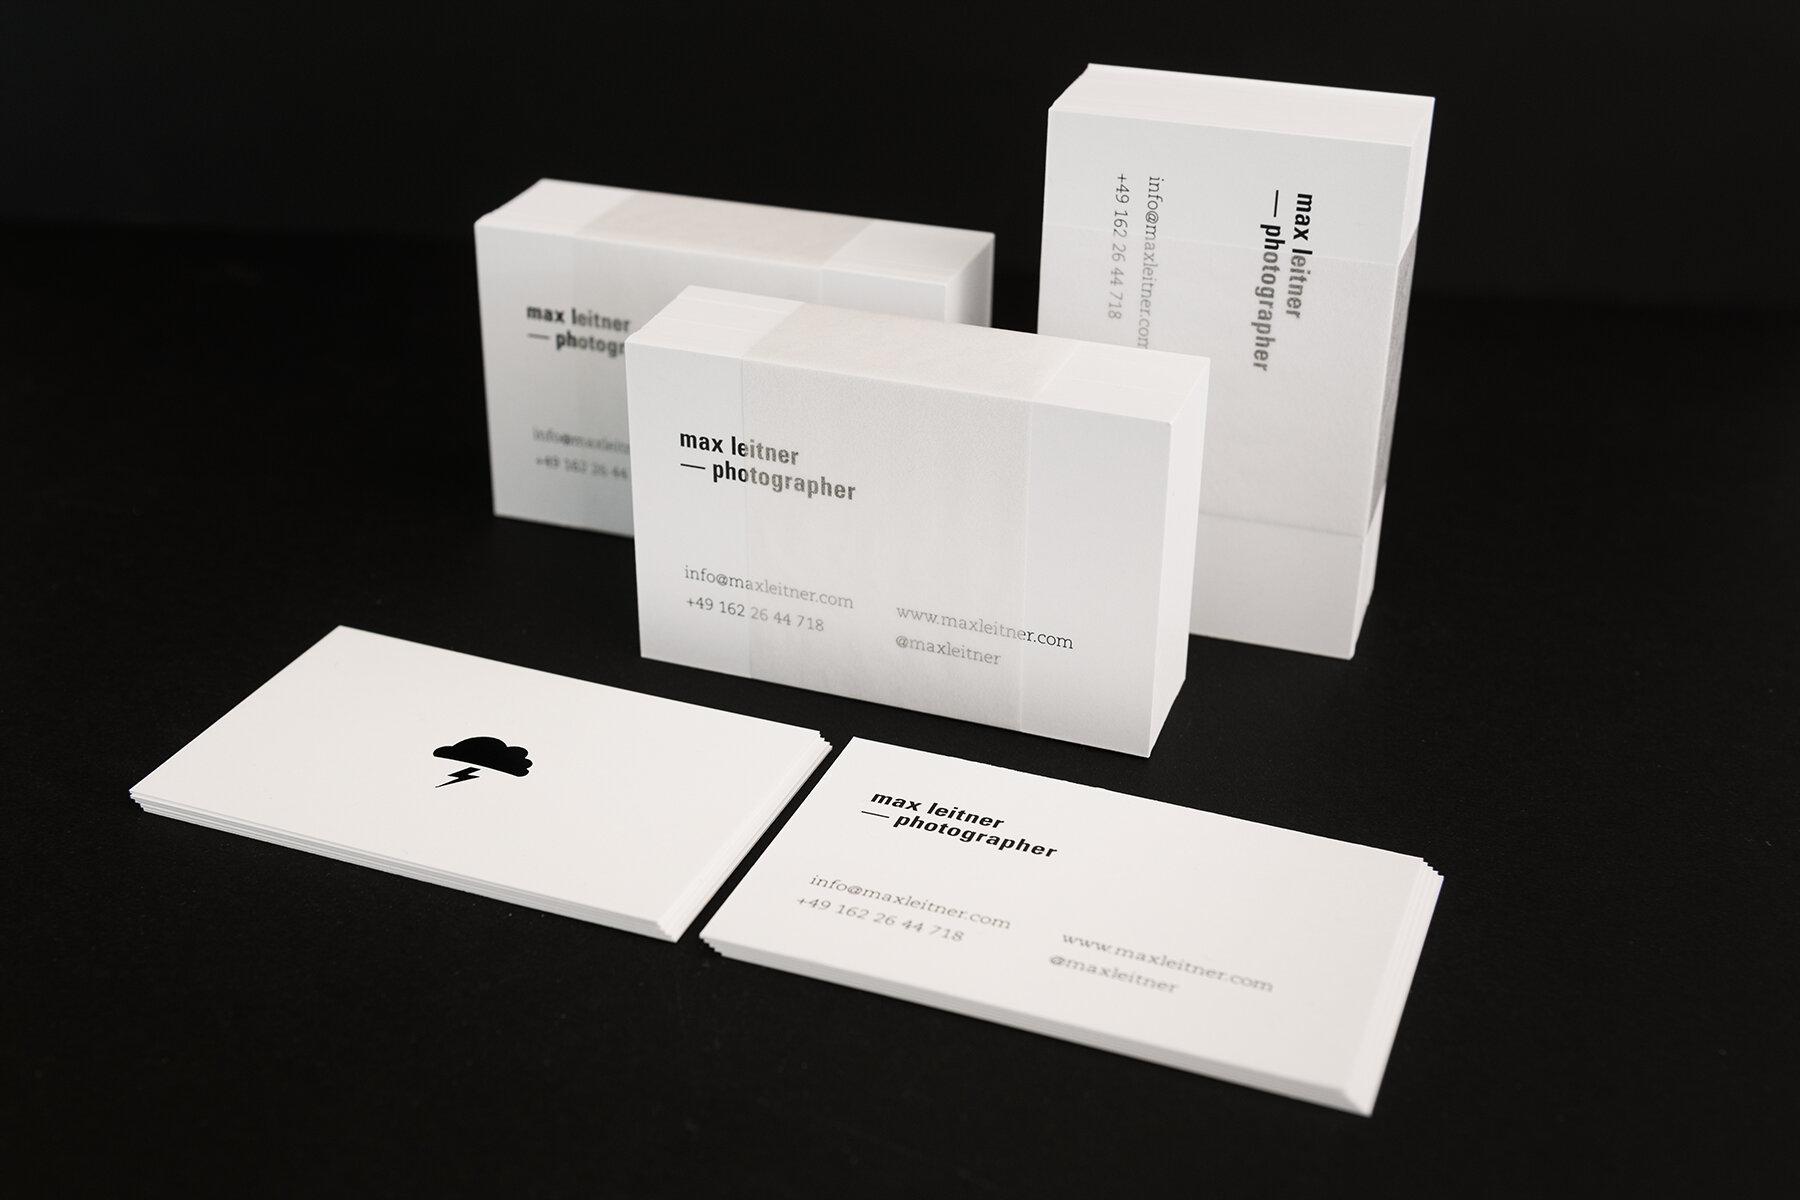 design-sabinemescher-visitenkarten-max-leitner.jpg